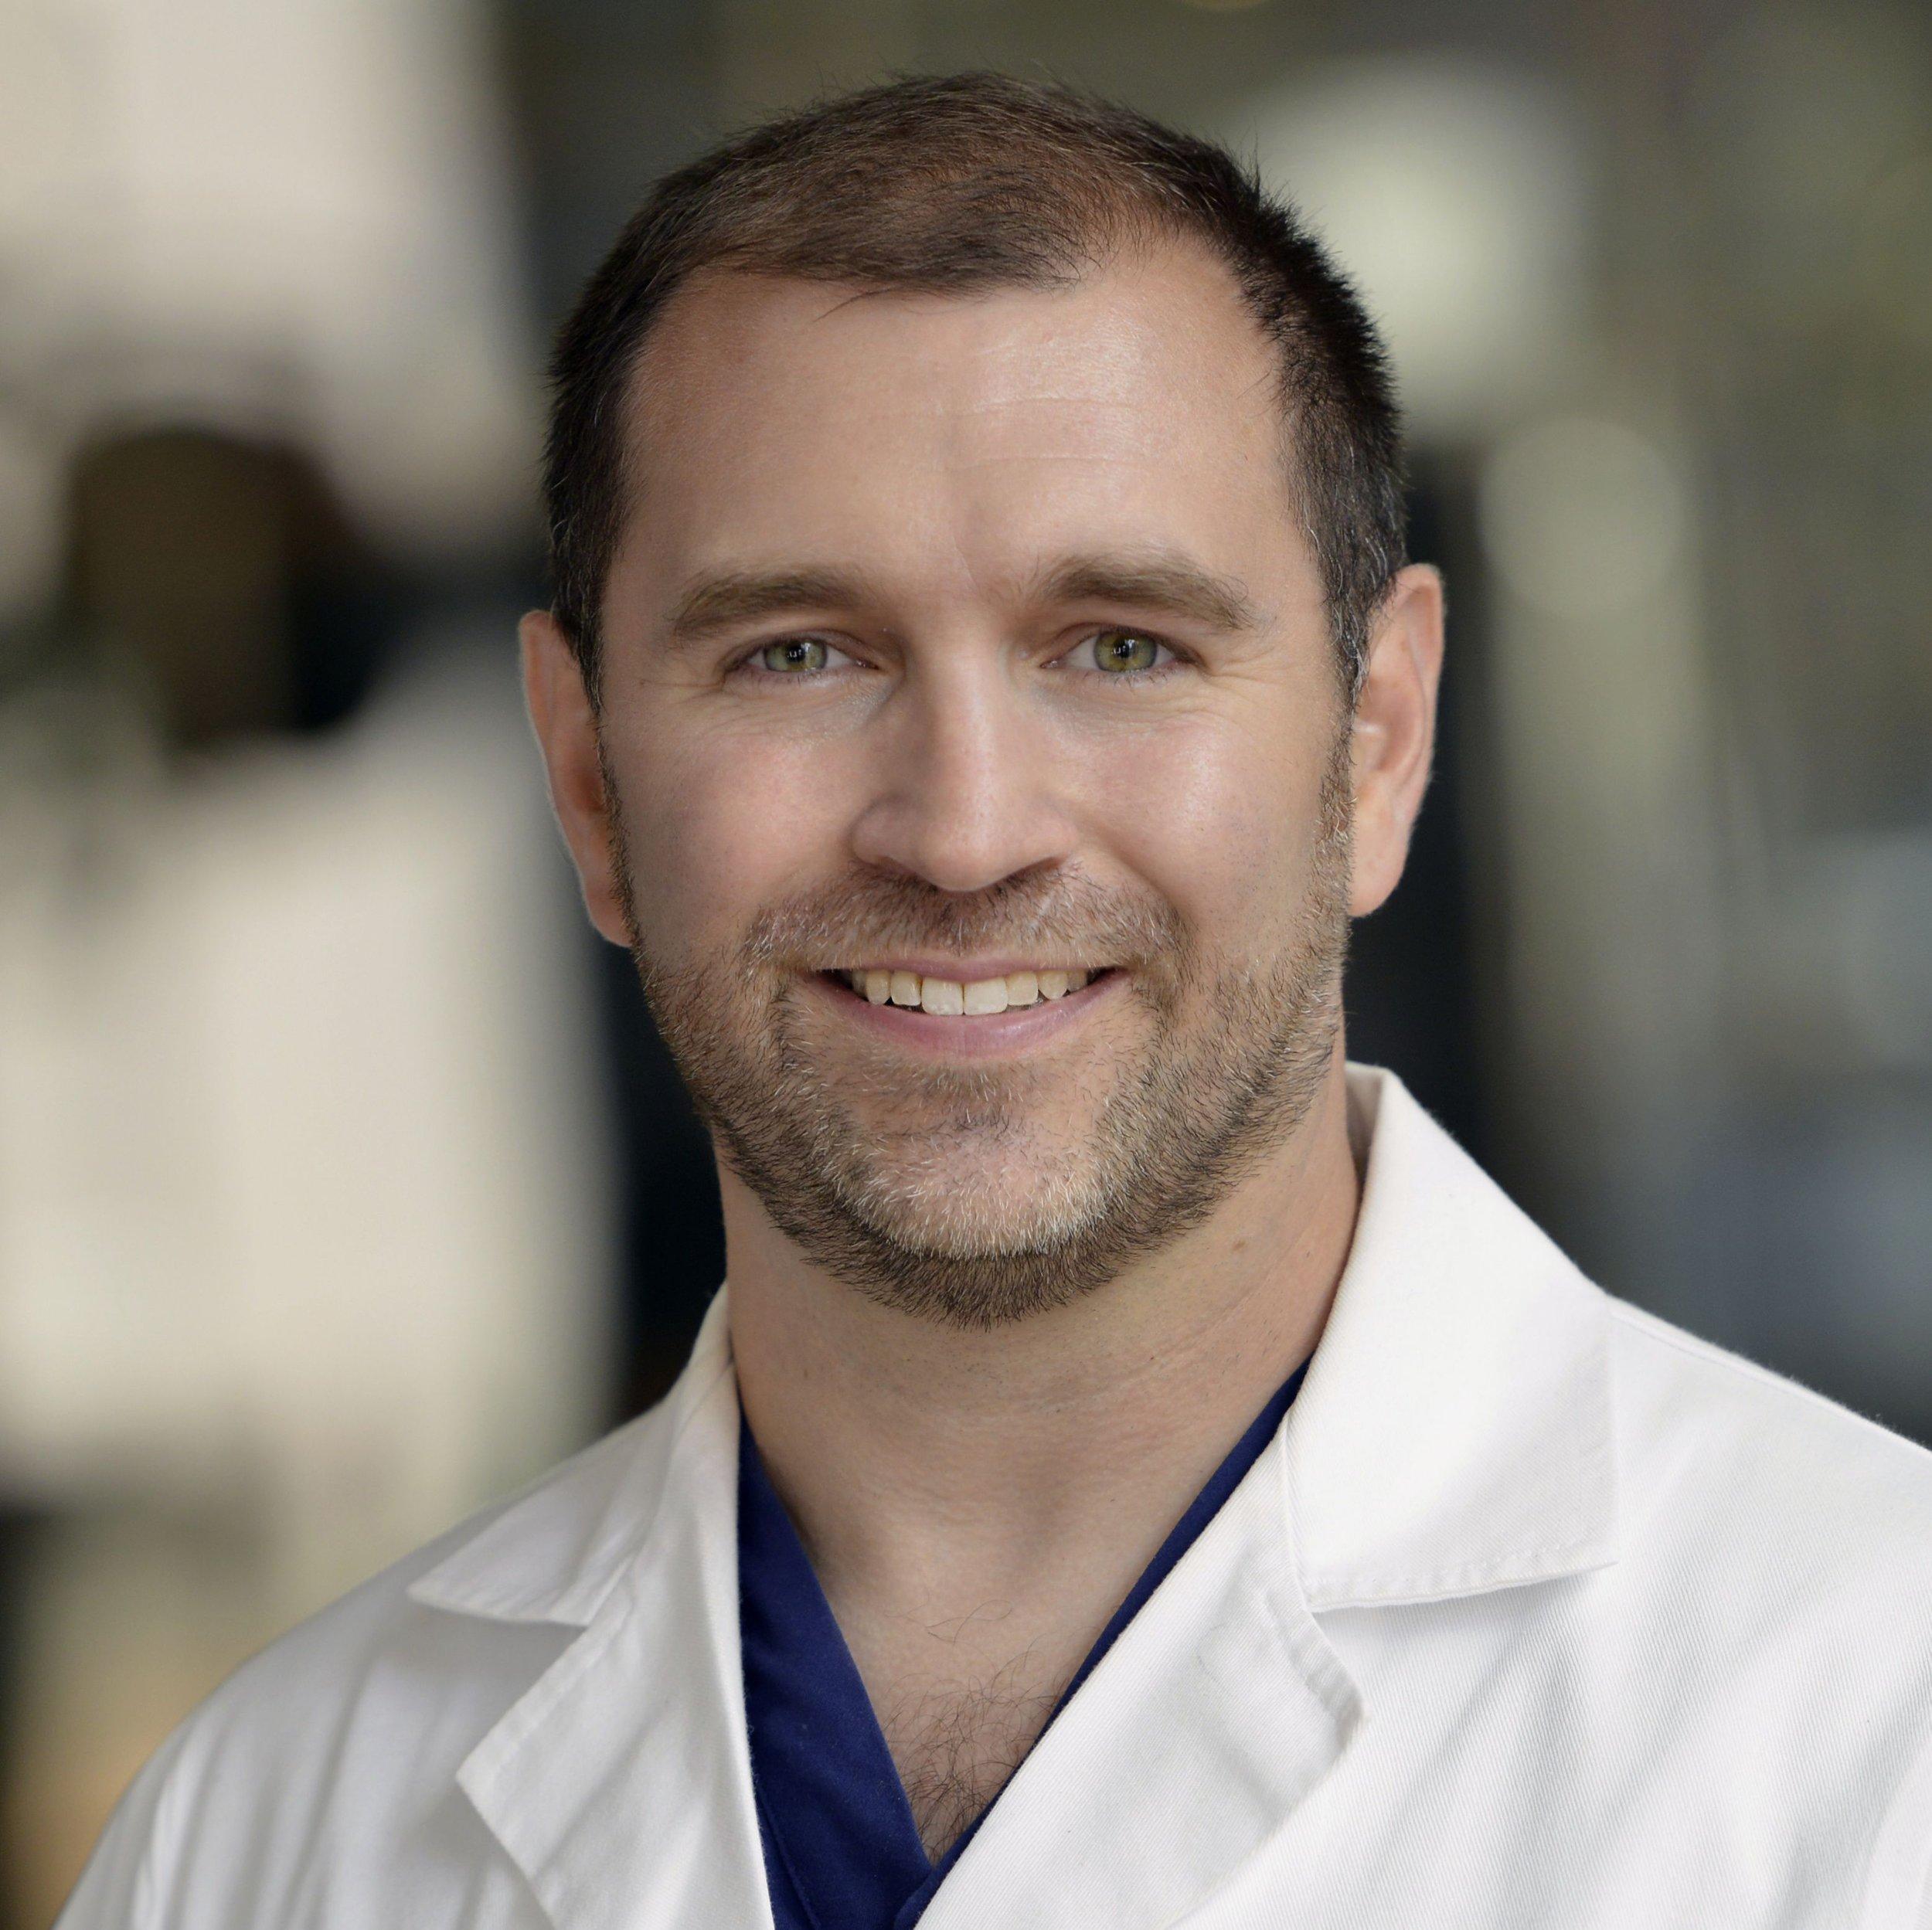 Dr. Erik Antonsen